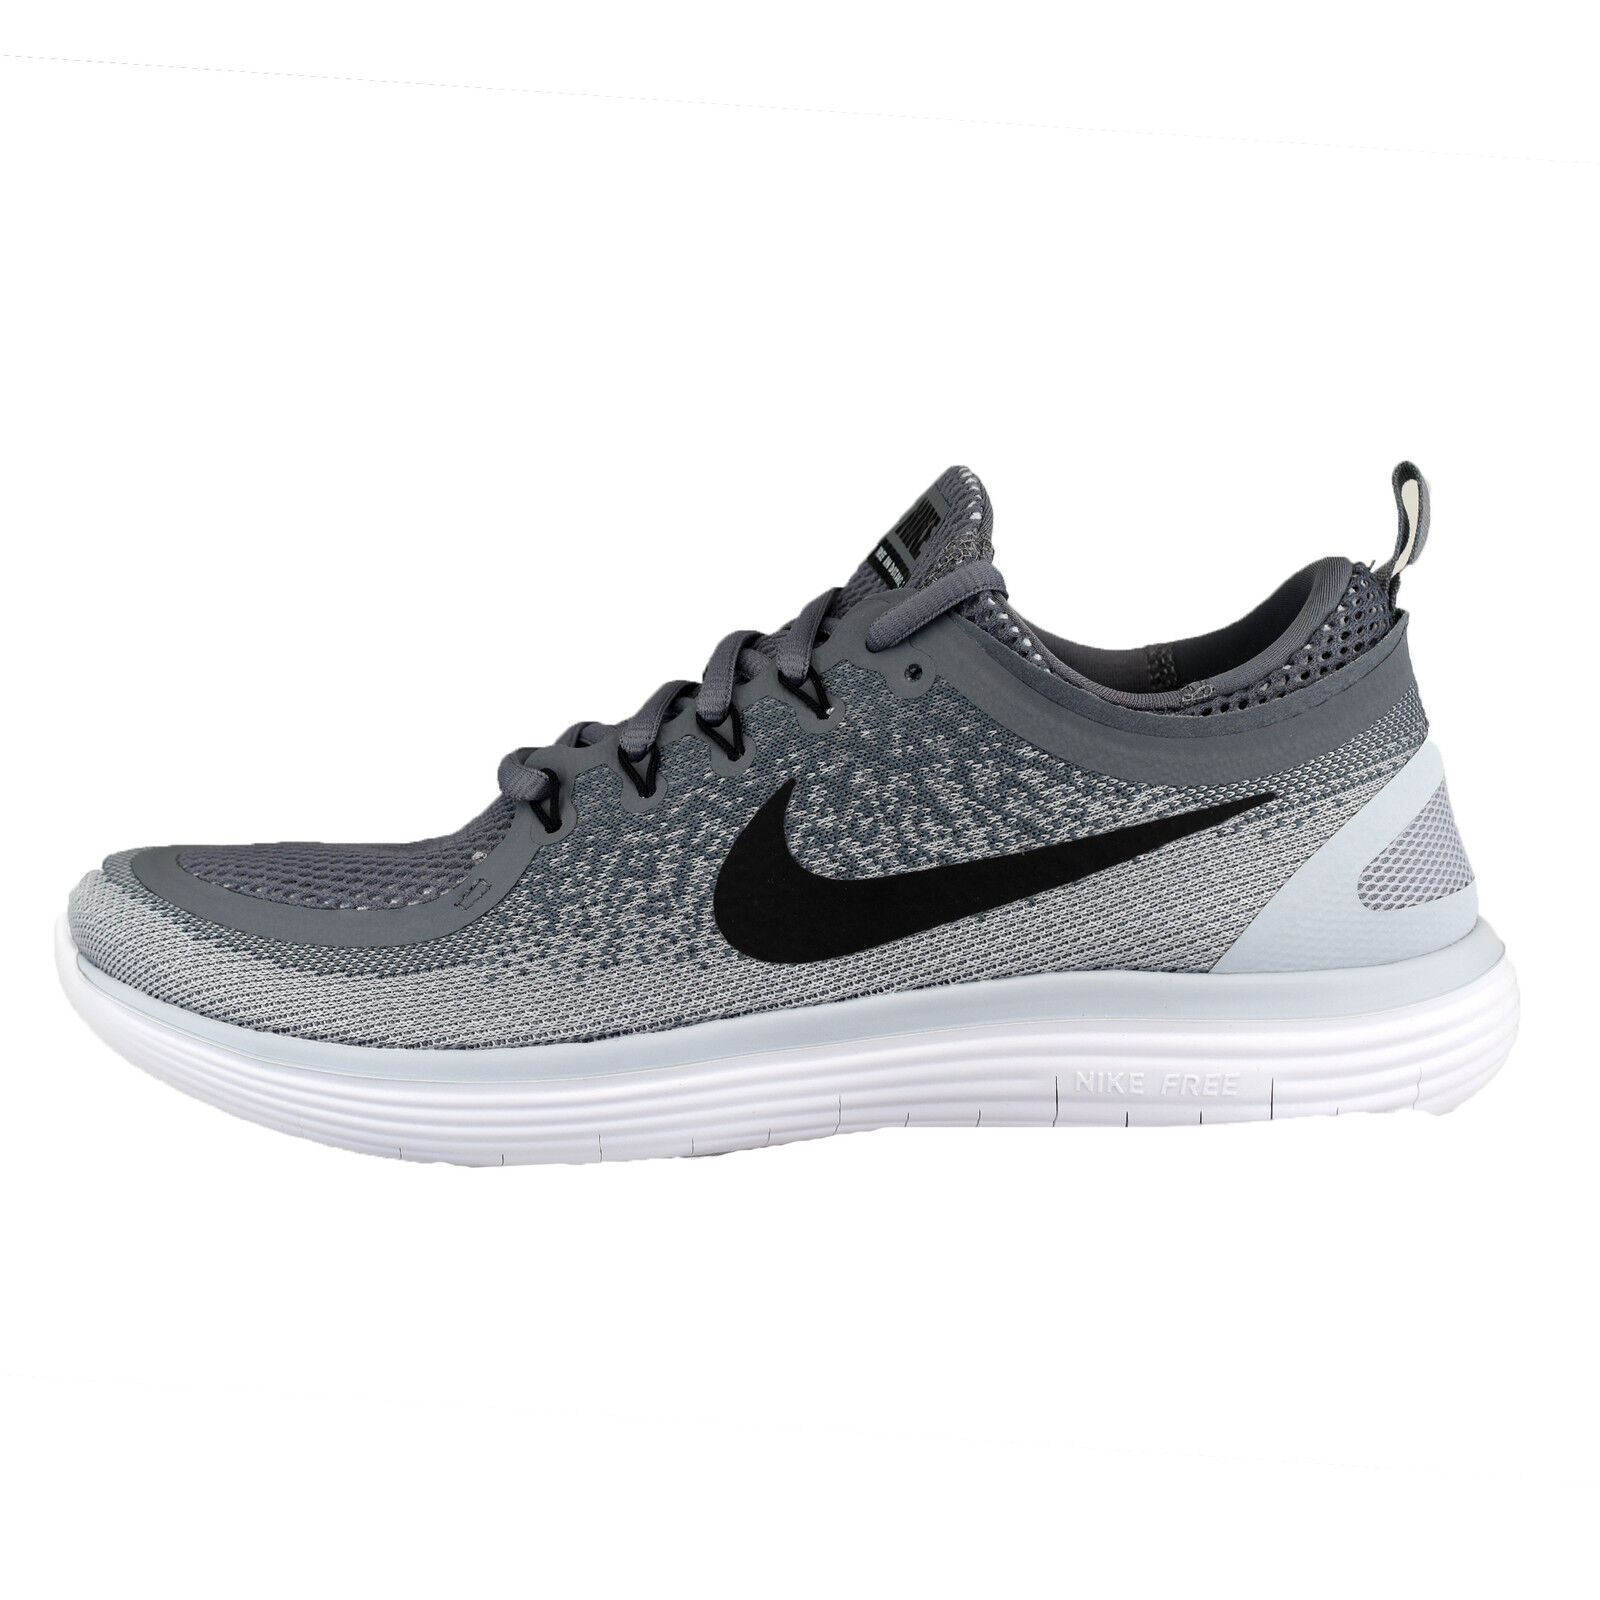 NIKE Free RN distance 2 863775-002 Scarpe da corsa running running running tempo libero scarpe da ginnastica accdbb